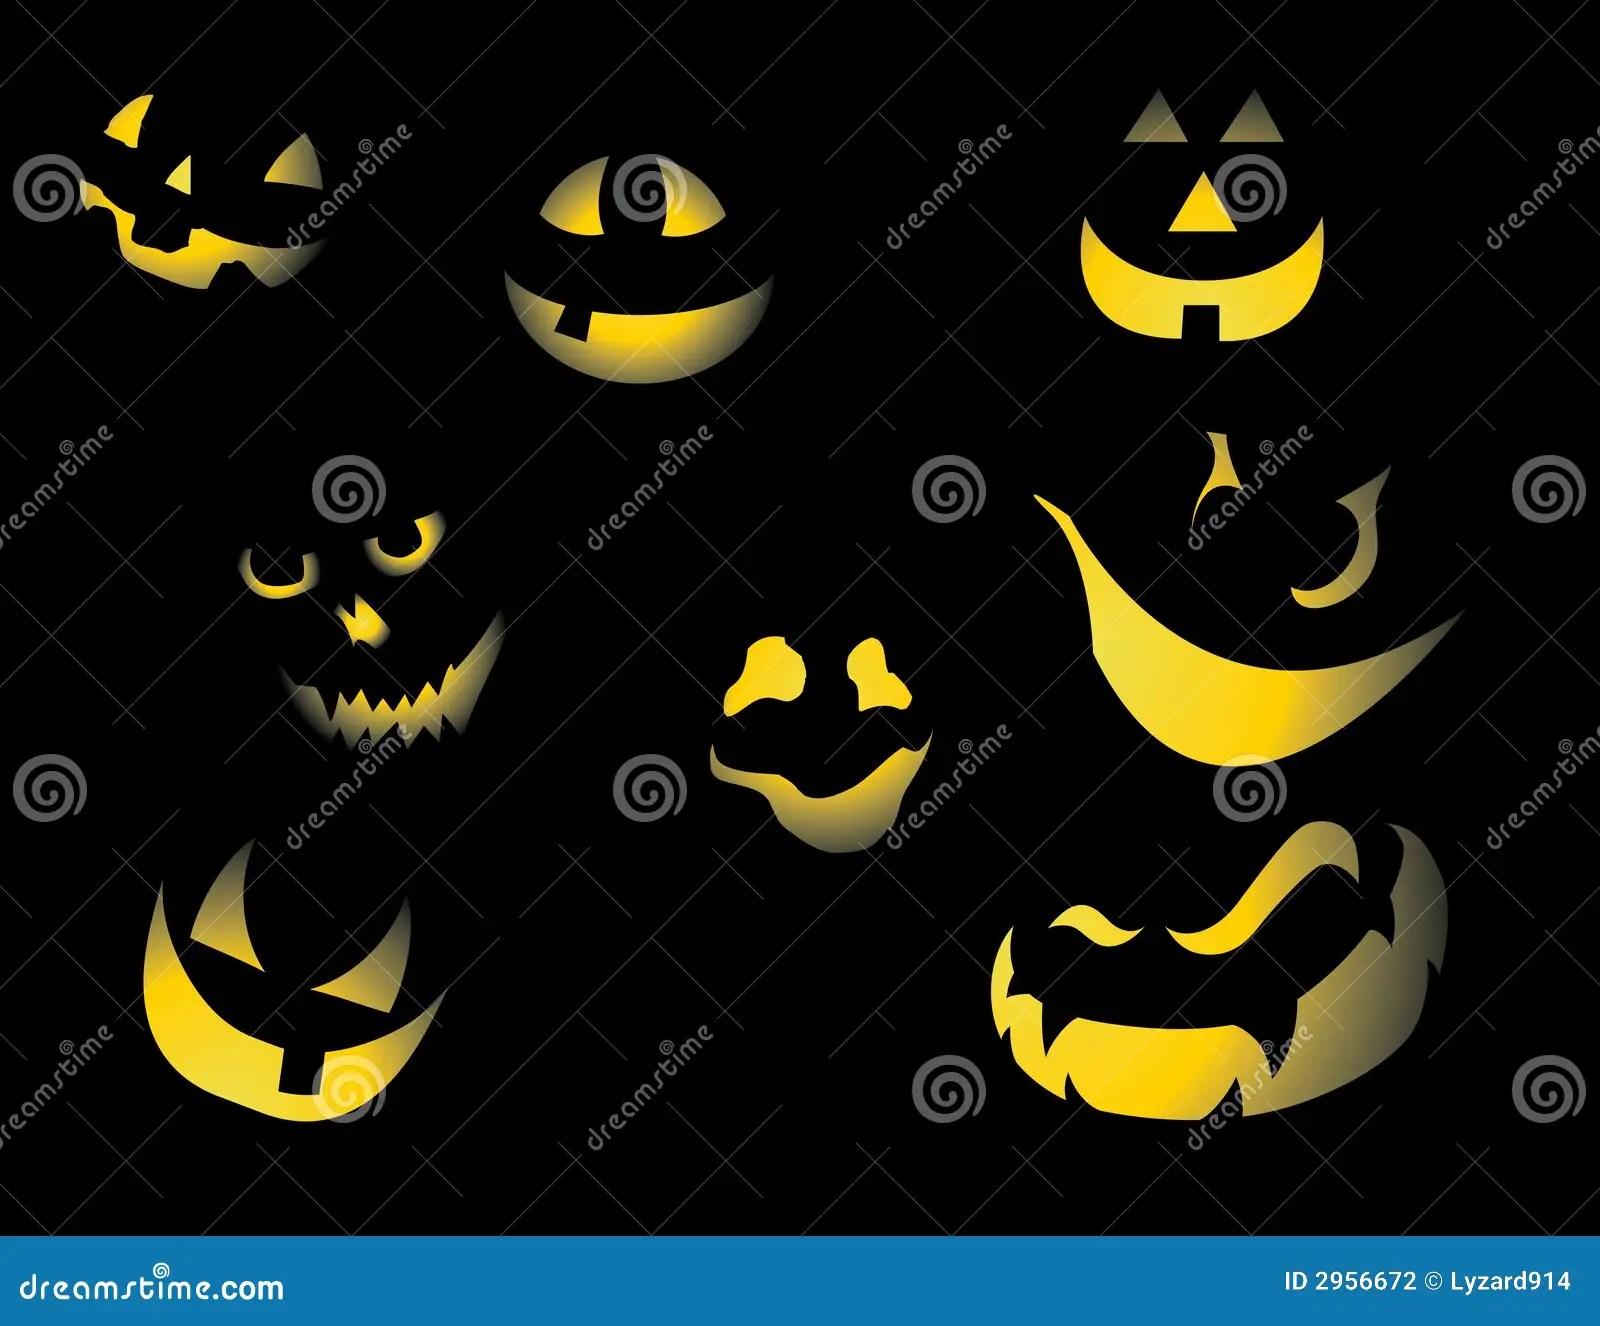 Pumpkin Faces Stock Photography